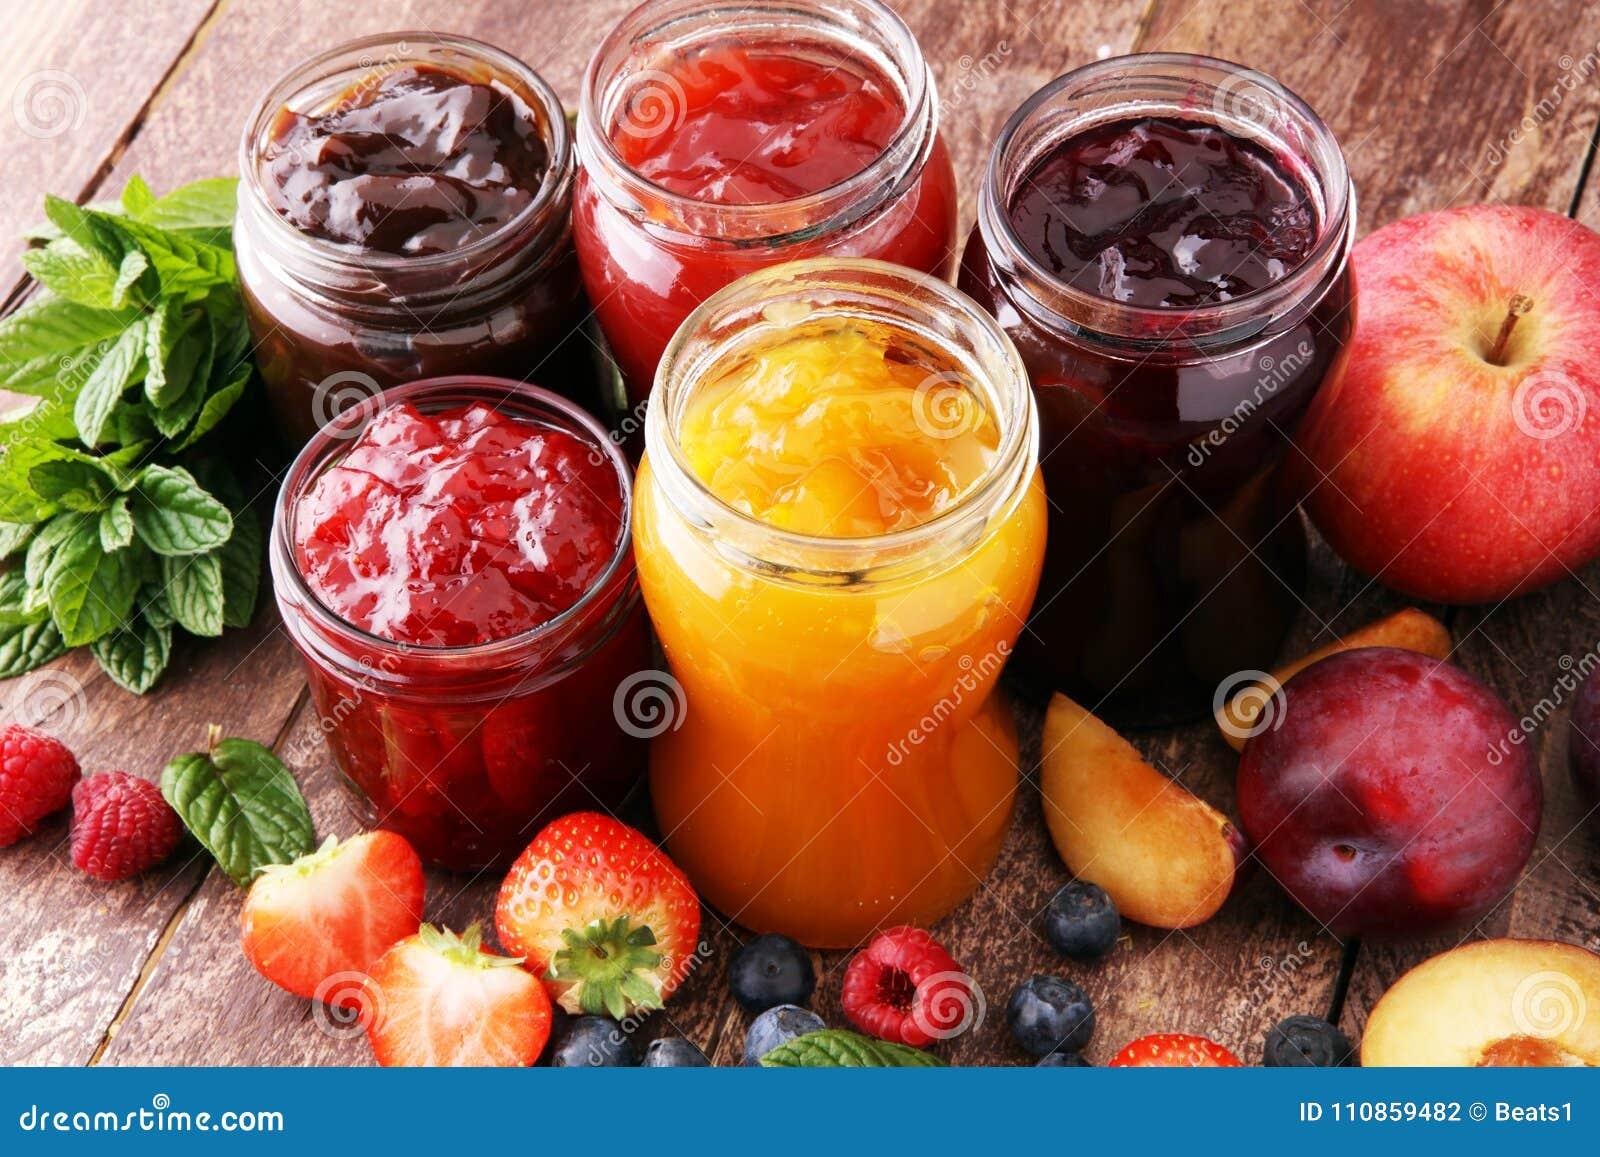 Assortment of jams, seasonal berries, plums, mint and fruits.